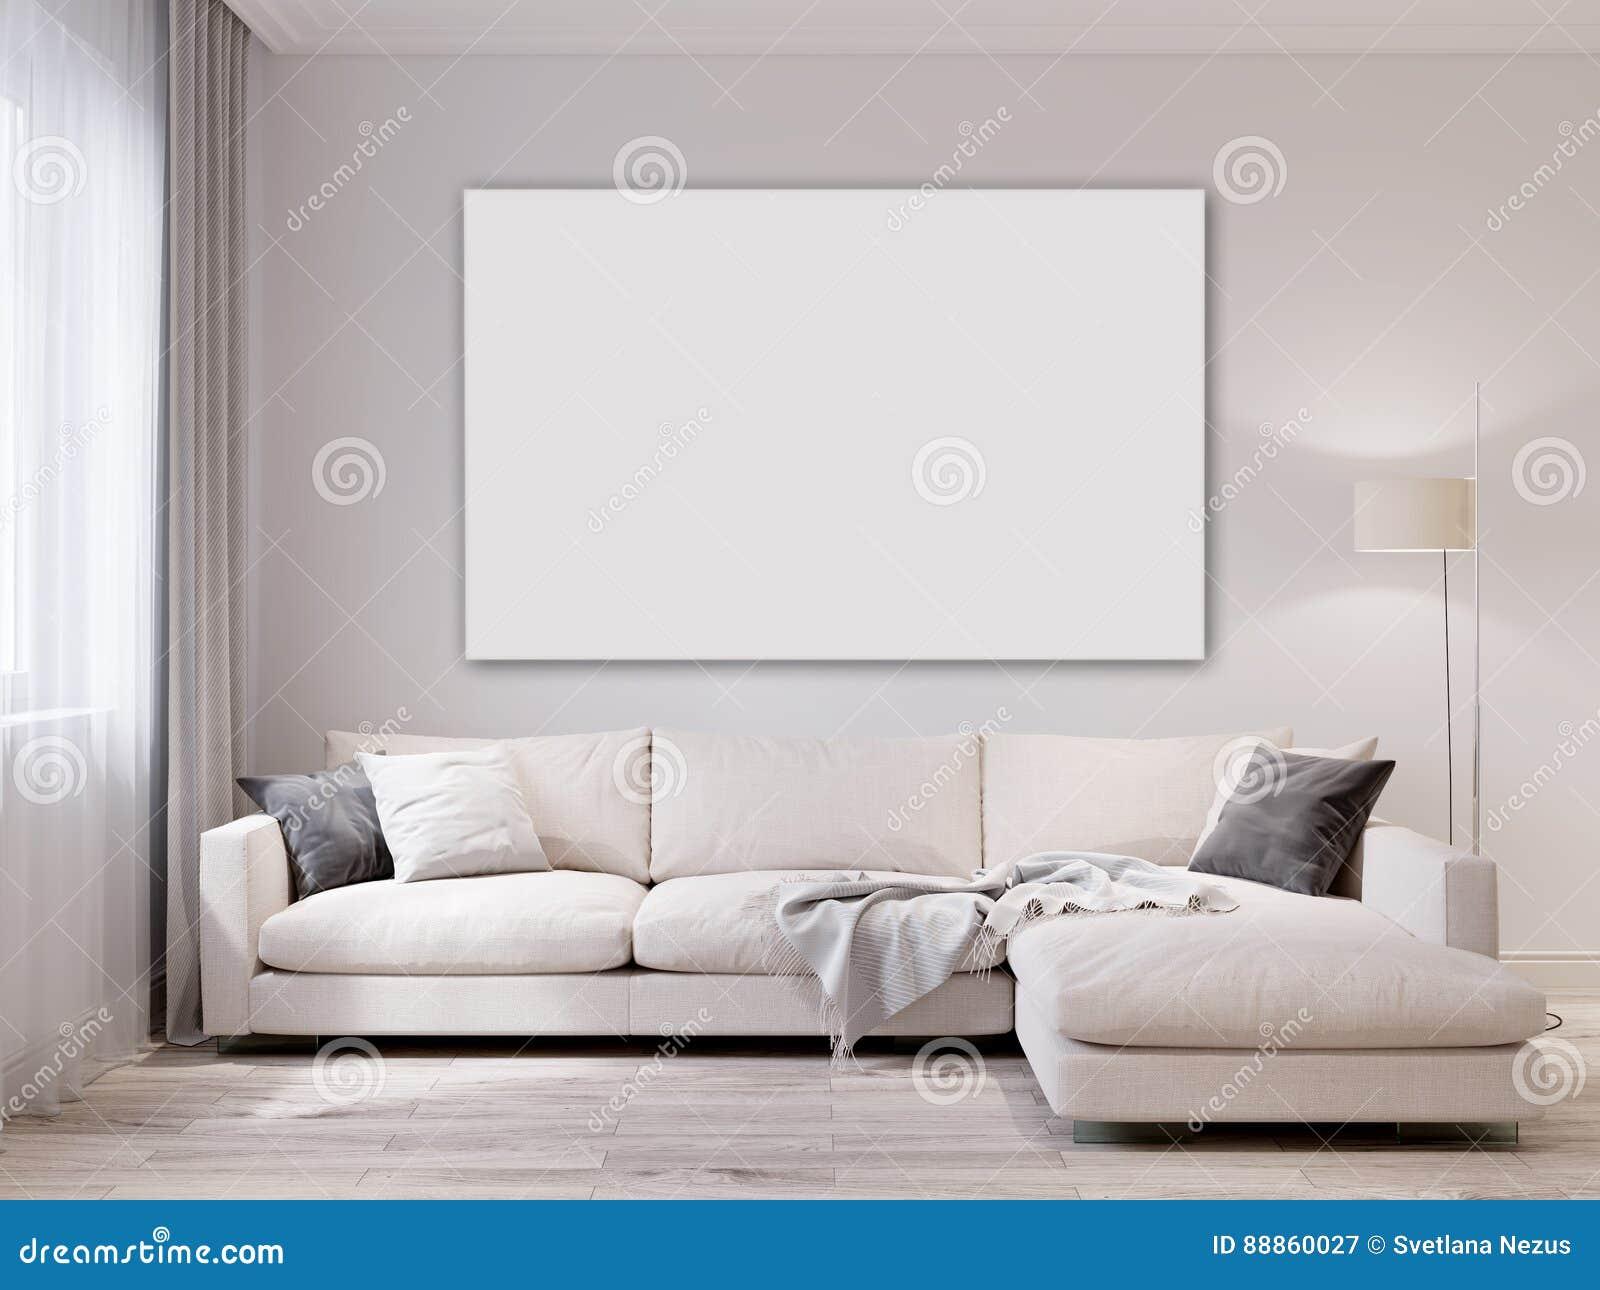 Mock up white wall modern living room interior